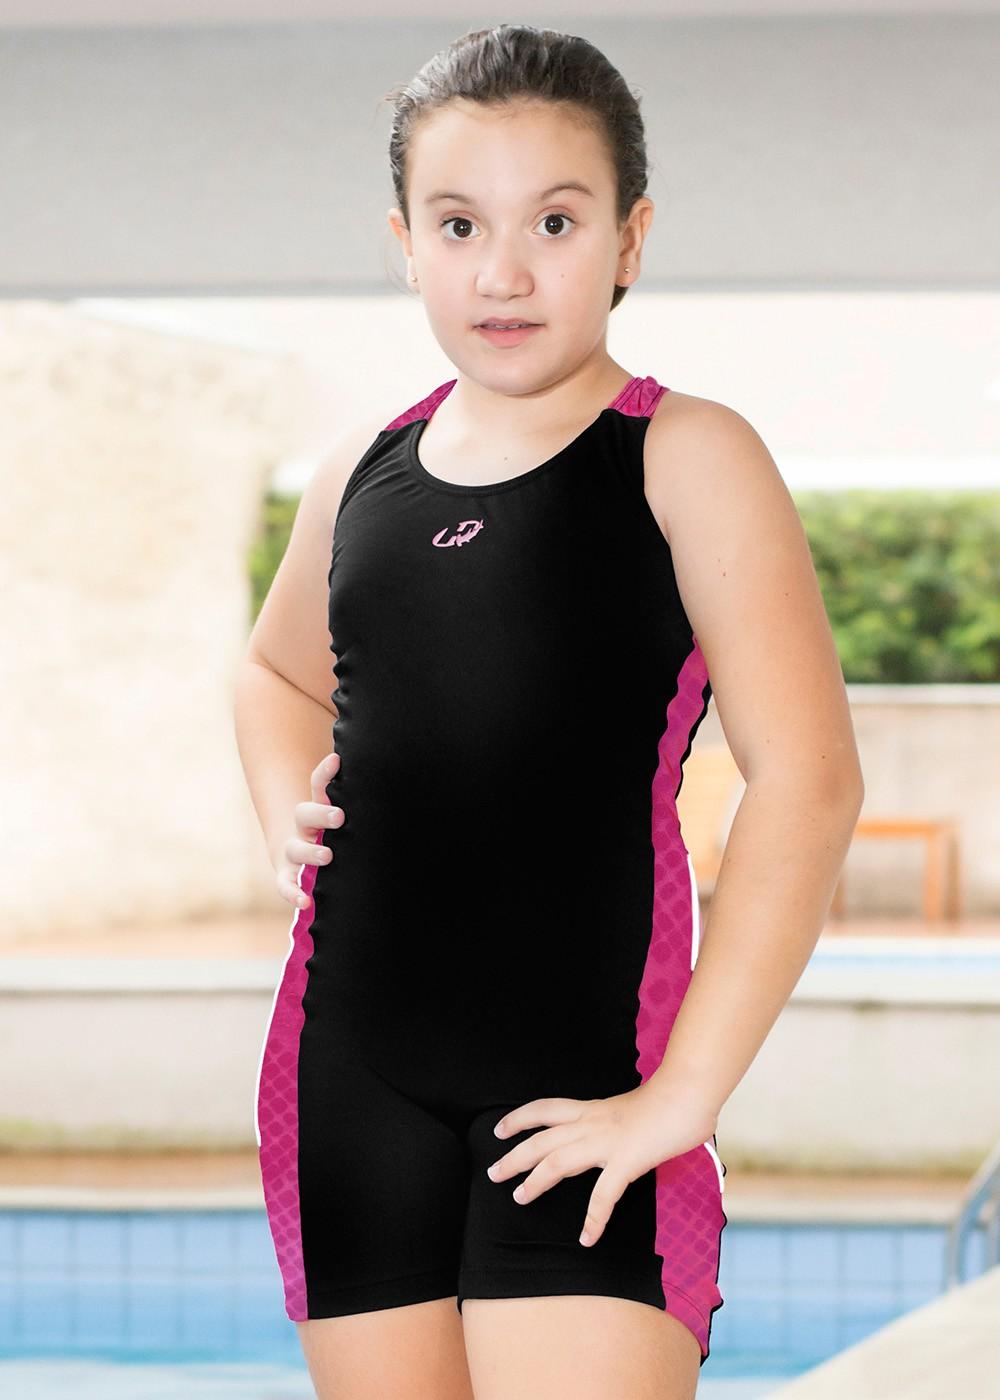 MACAQUINHO KIDS HELANCA GIRLS HAMMERHEAD - PRETO/PINK RELEVO